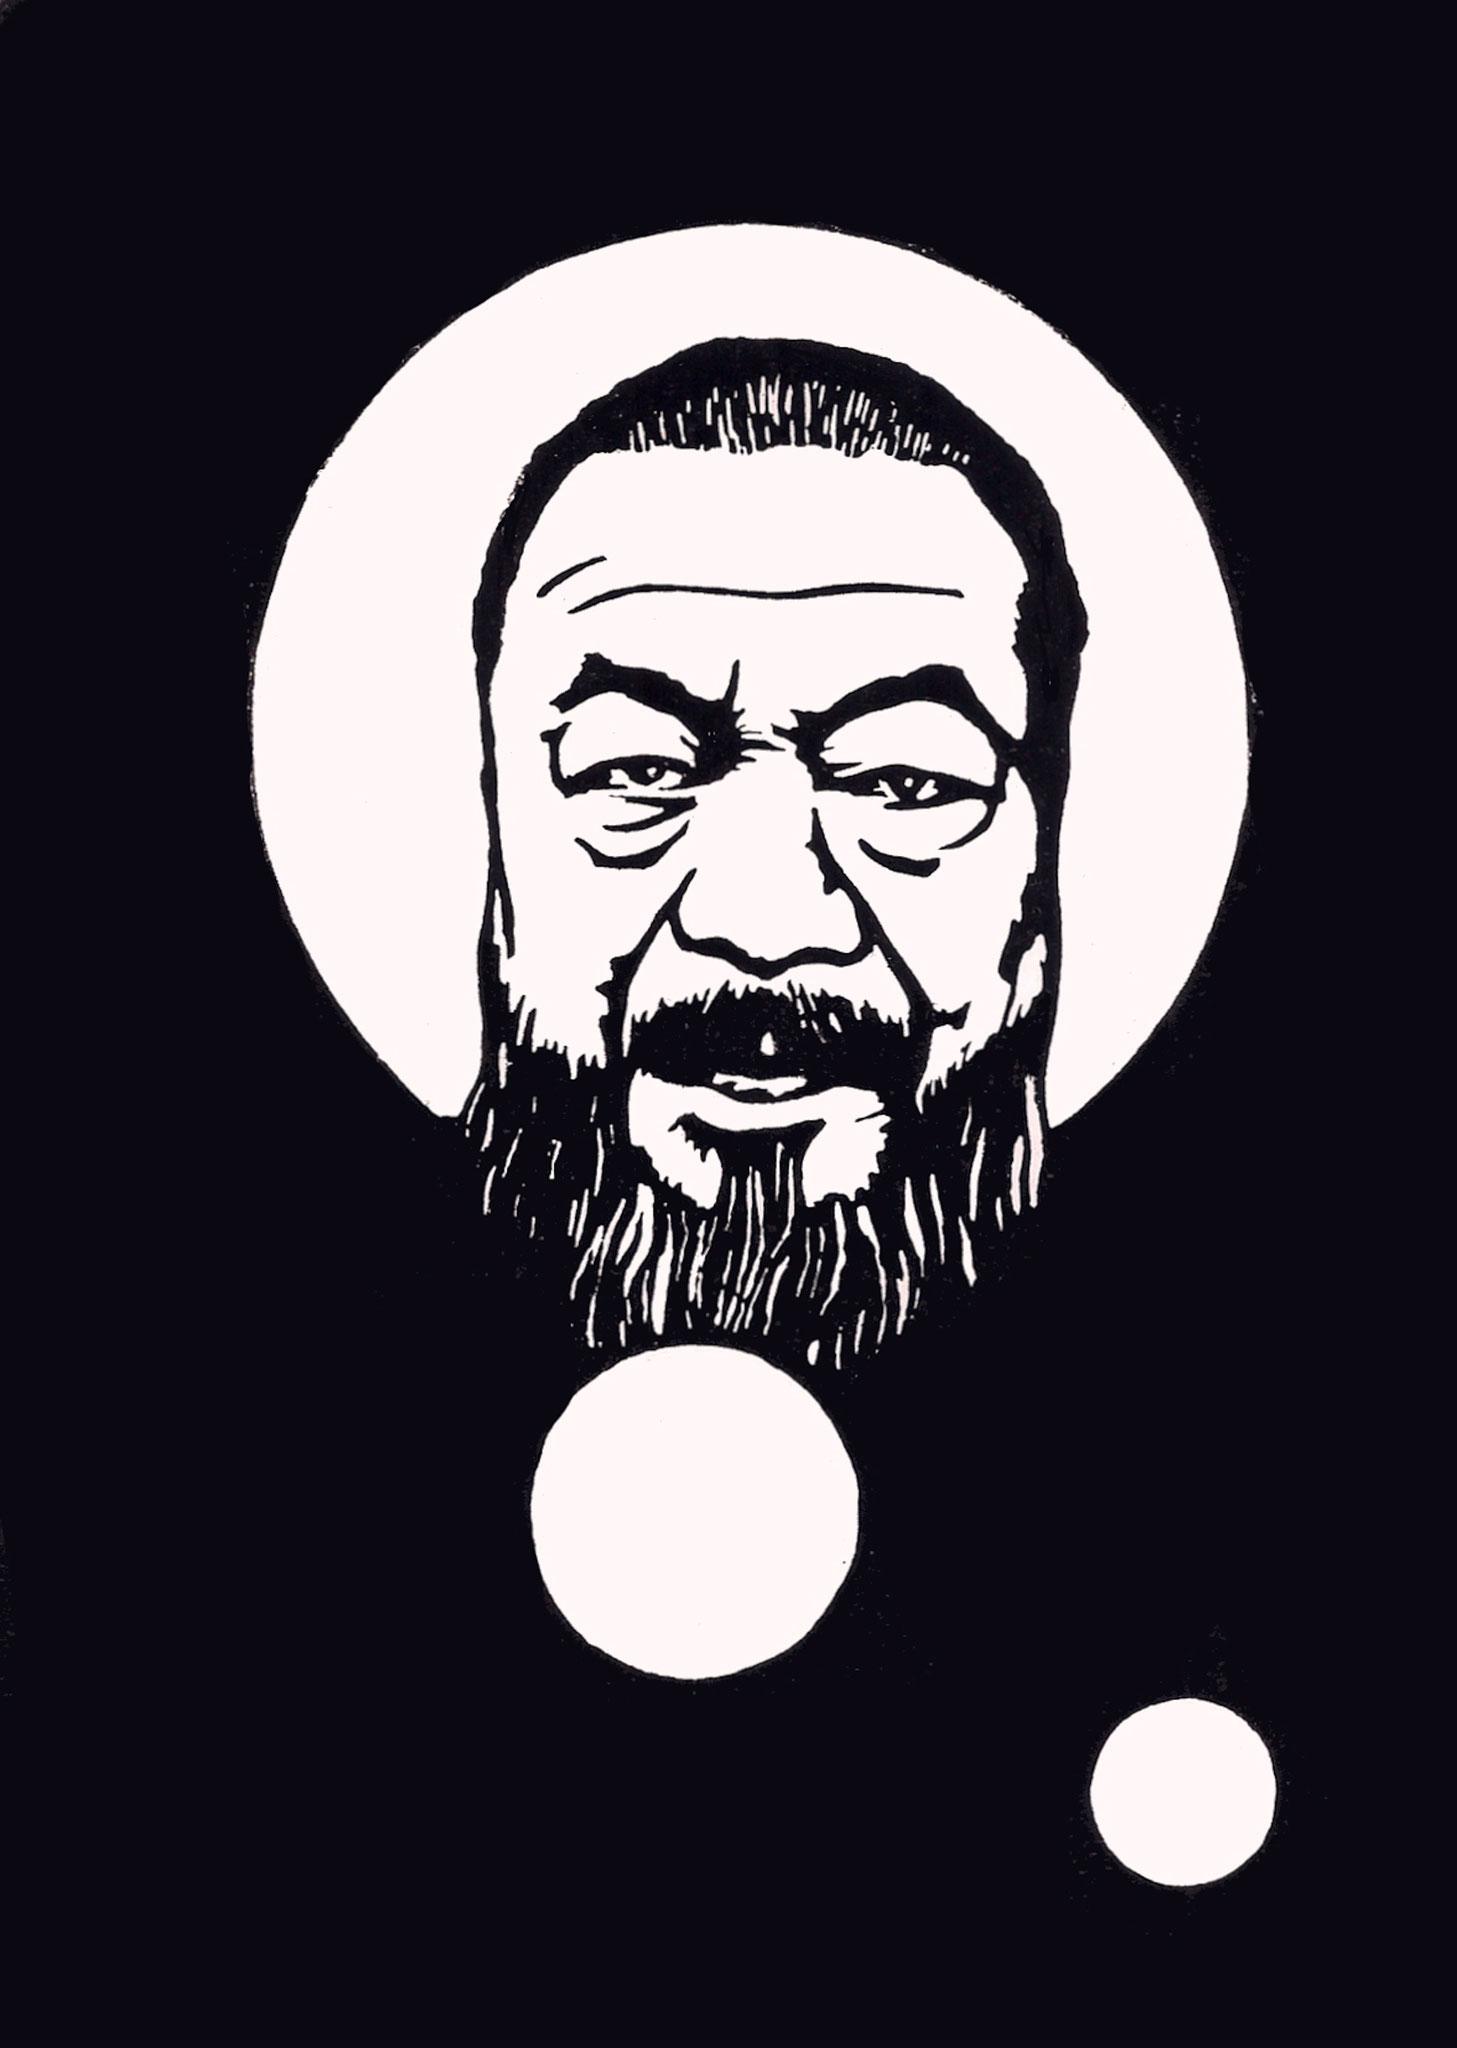 Ai Weiwei, 11/11/2017, Edition 5, A5